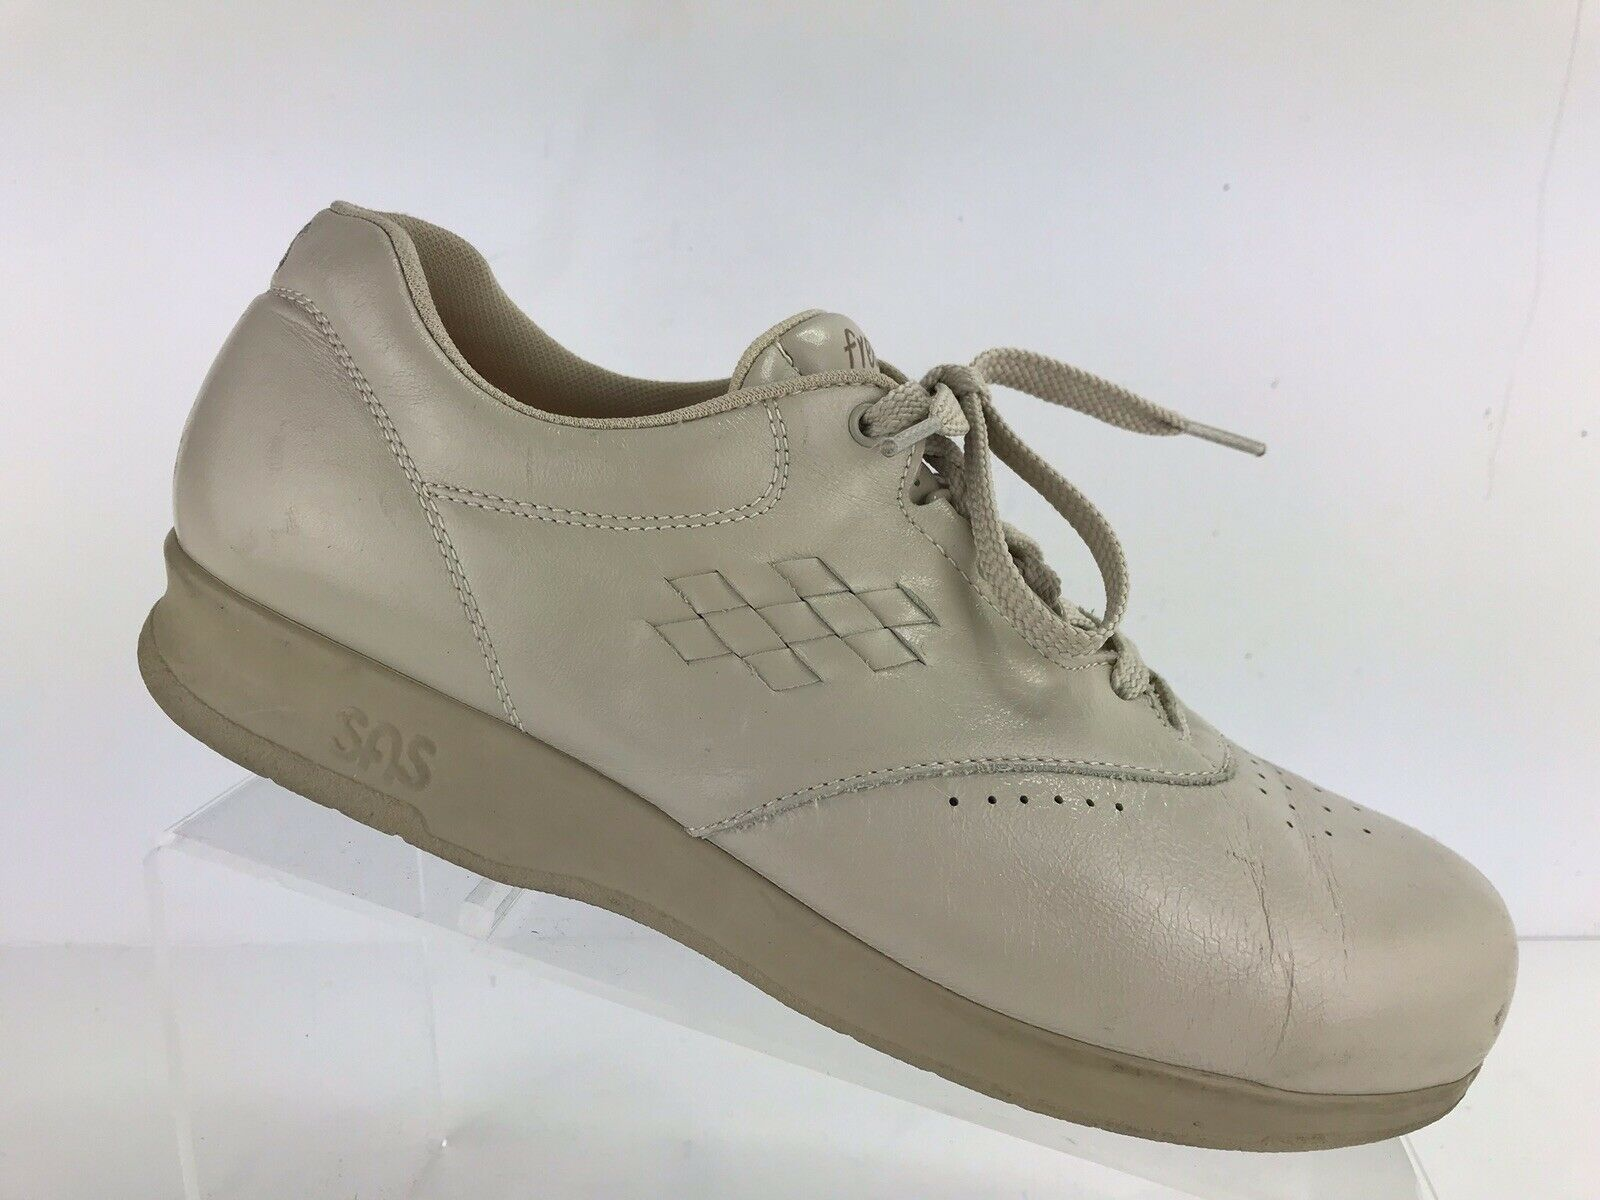 SAS Free Time Women's 8.5 M Diabetic Comfort Walking shoes White Cream Leather